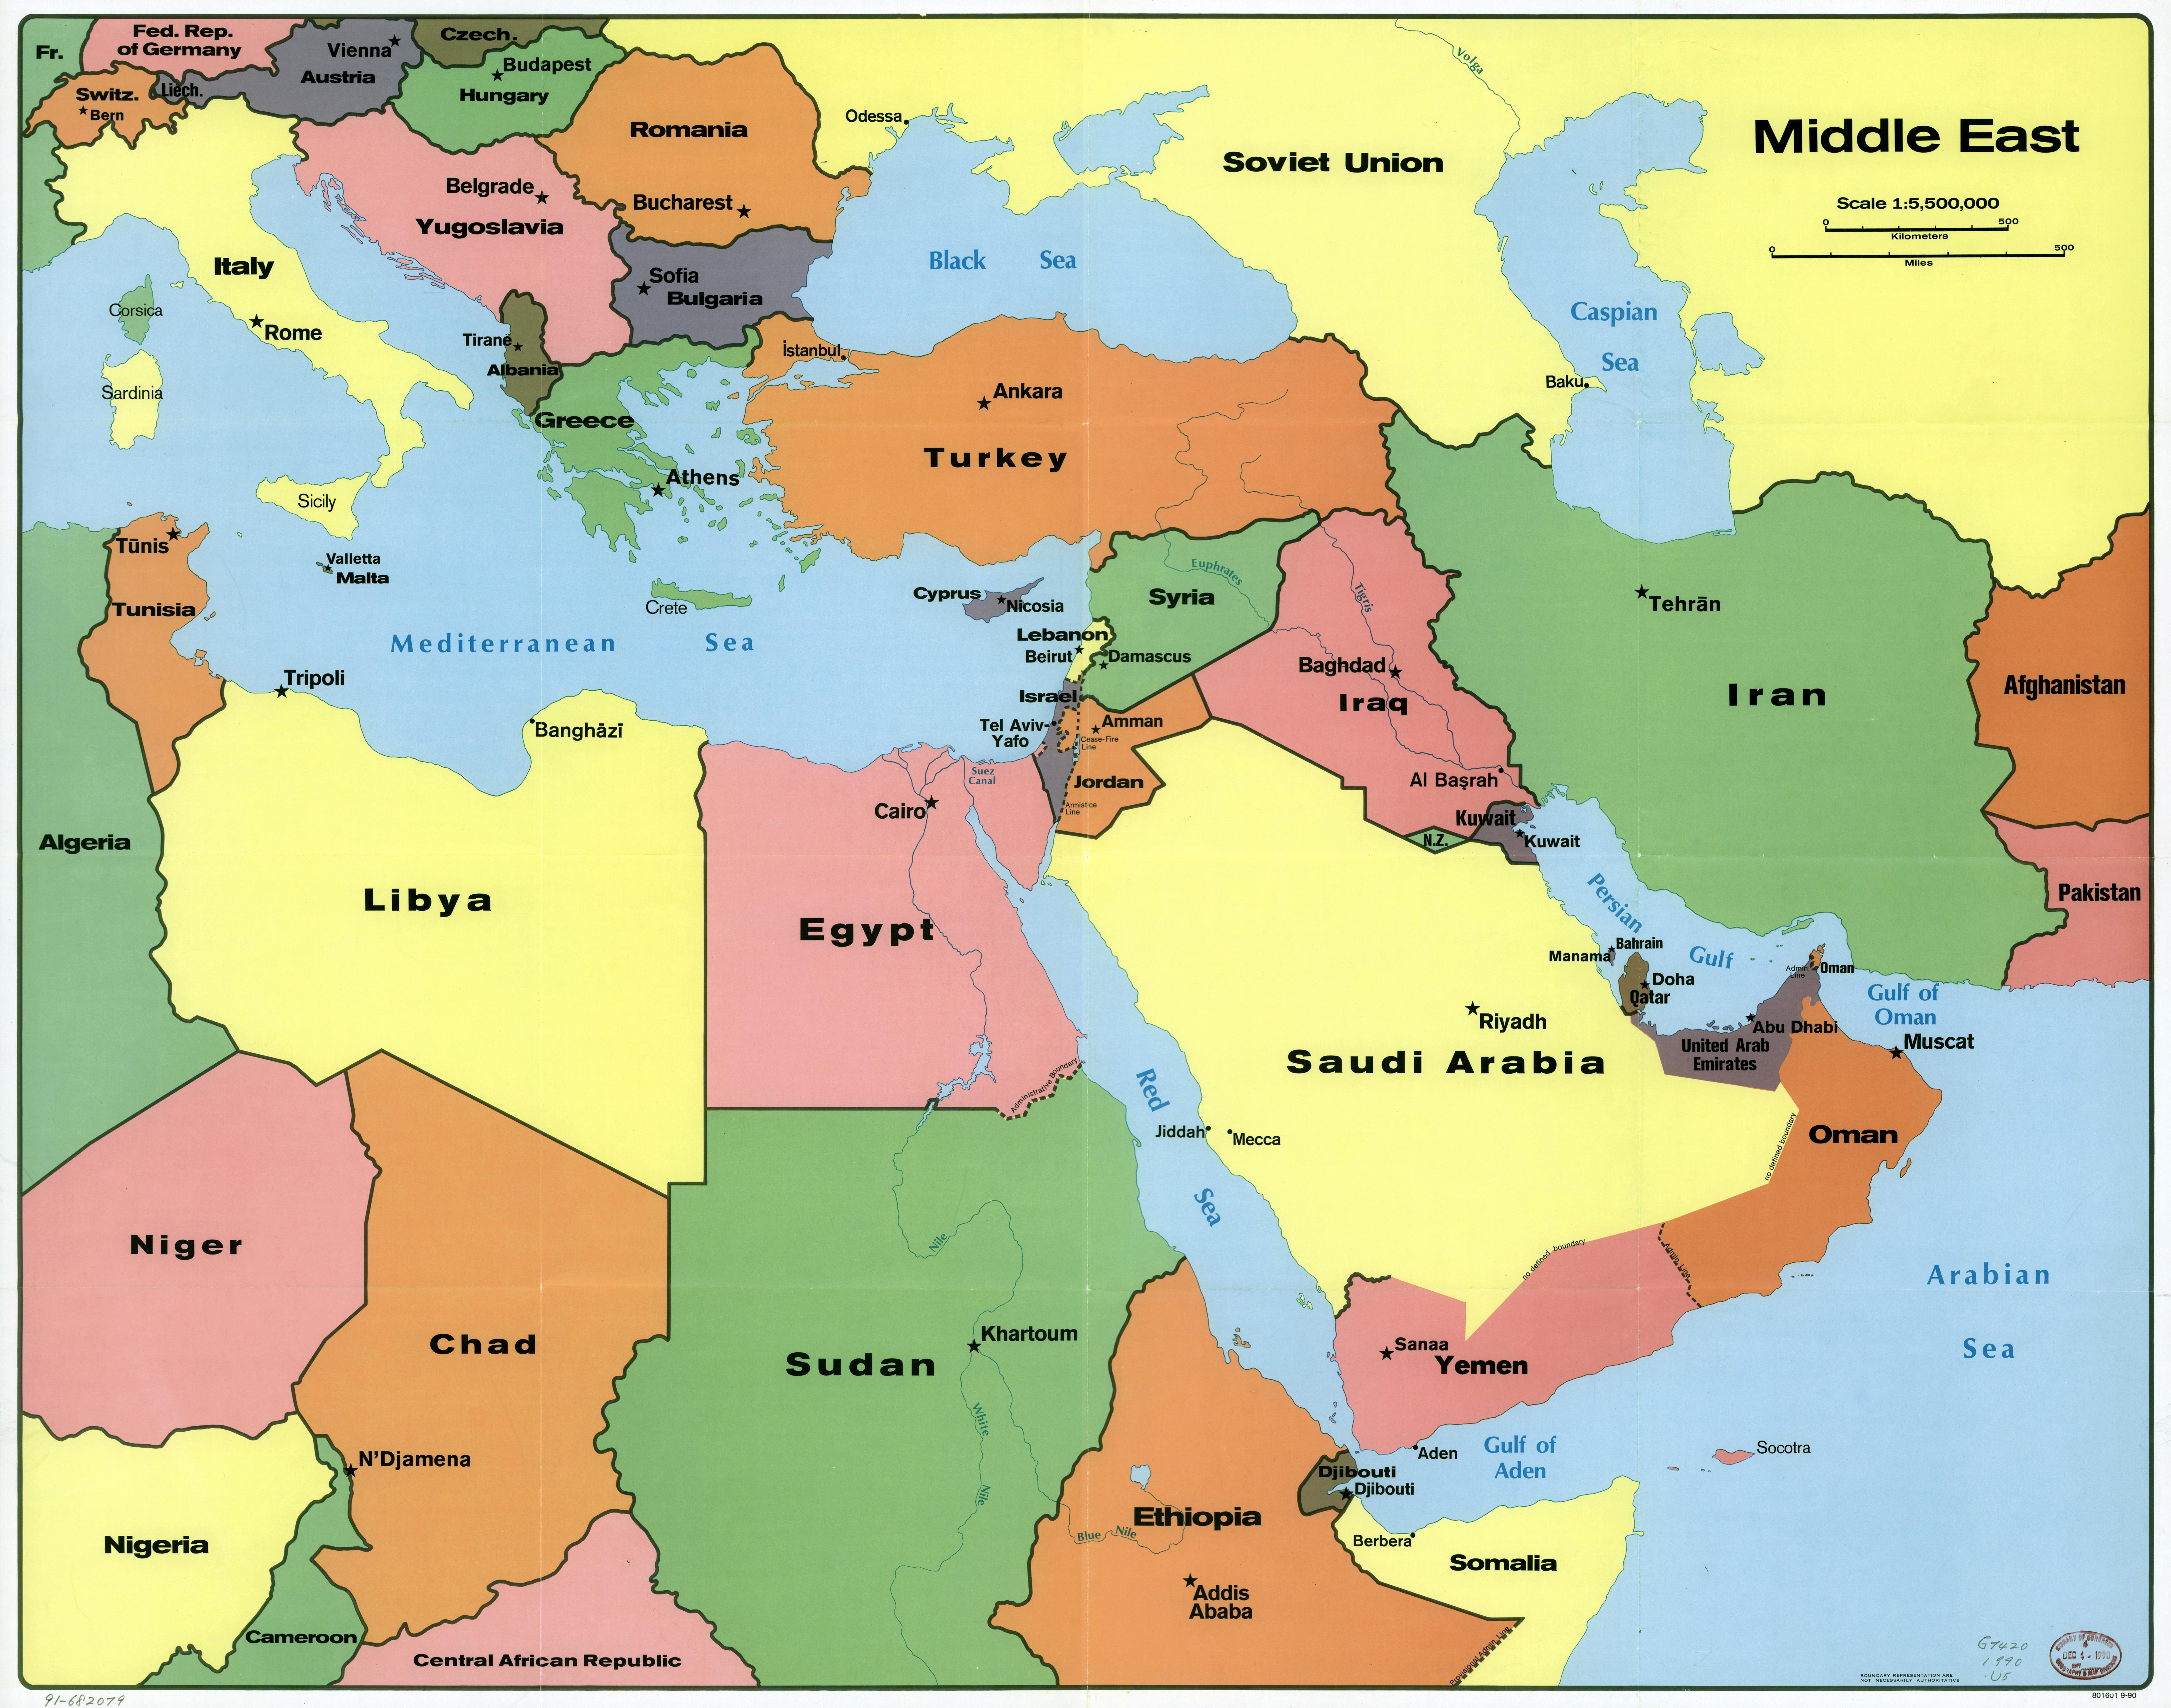 Picture of: Mapa Politico A Gran Escala De Oriente Medio Con Capitales 1990 Medio Oriente Asia Mapas Del Mundo